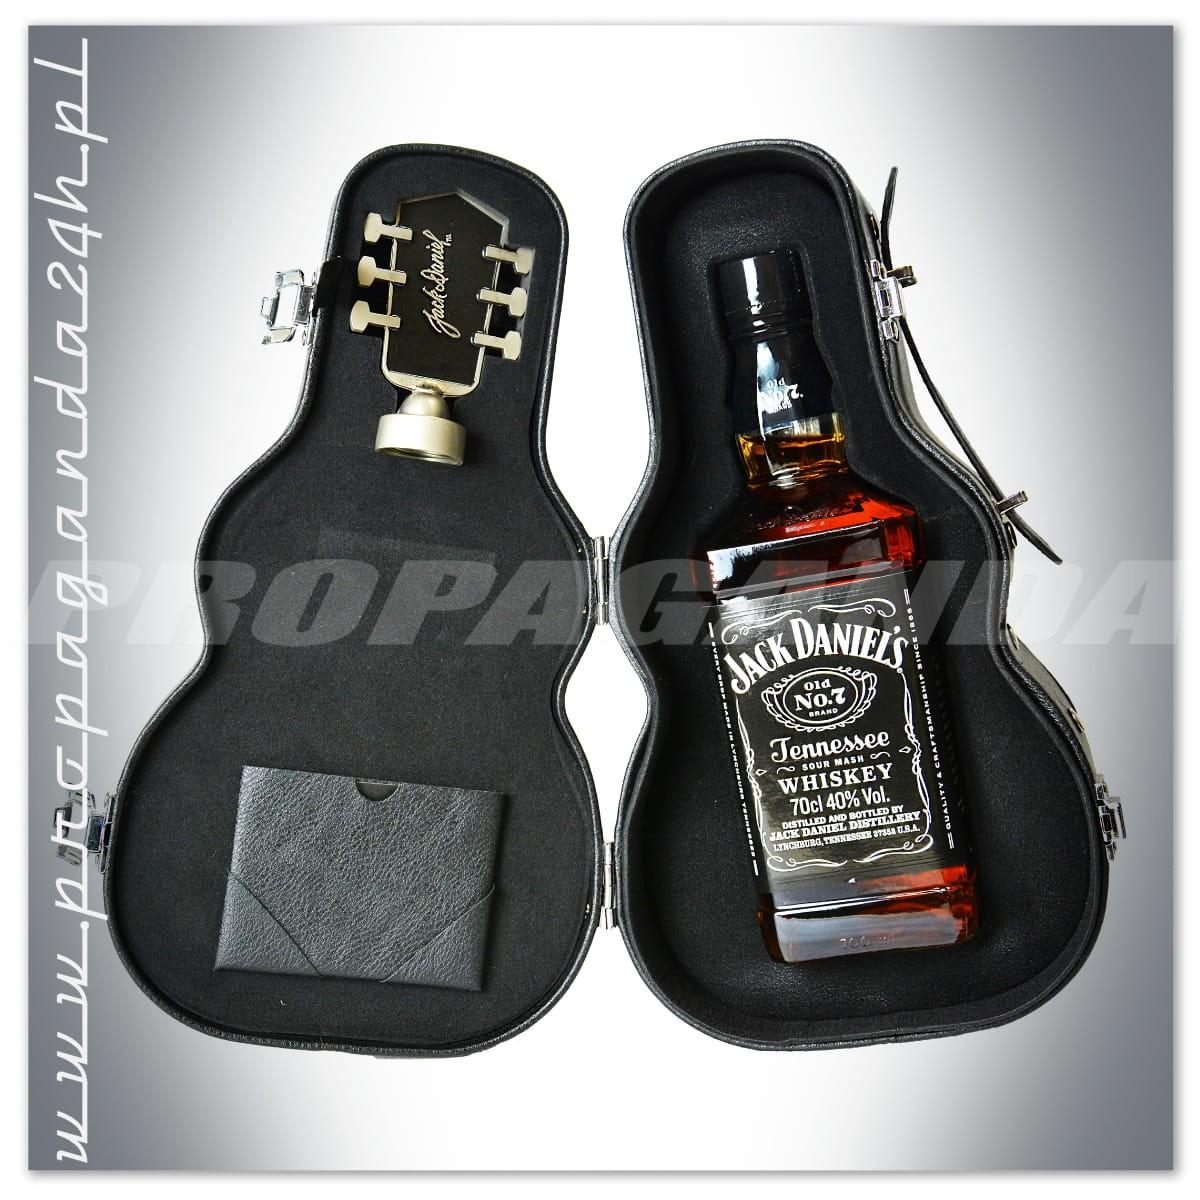 "Johny Walker Cena >> JACK DANIEL'S OLD NO.7 WHISKEY 0,7L ""GITARA""   Whiskey Jack Daniel's / WHISKY & BOURBON - Sklep ..."